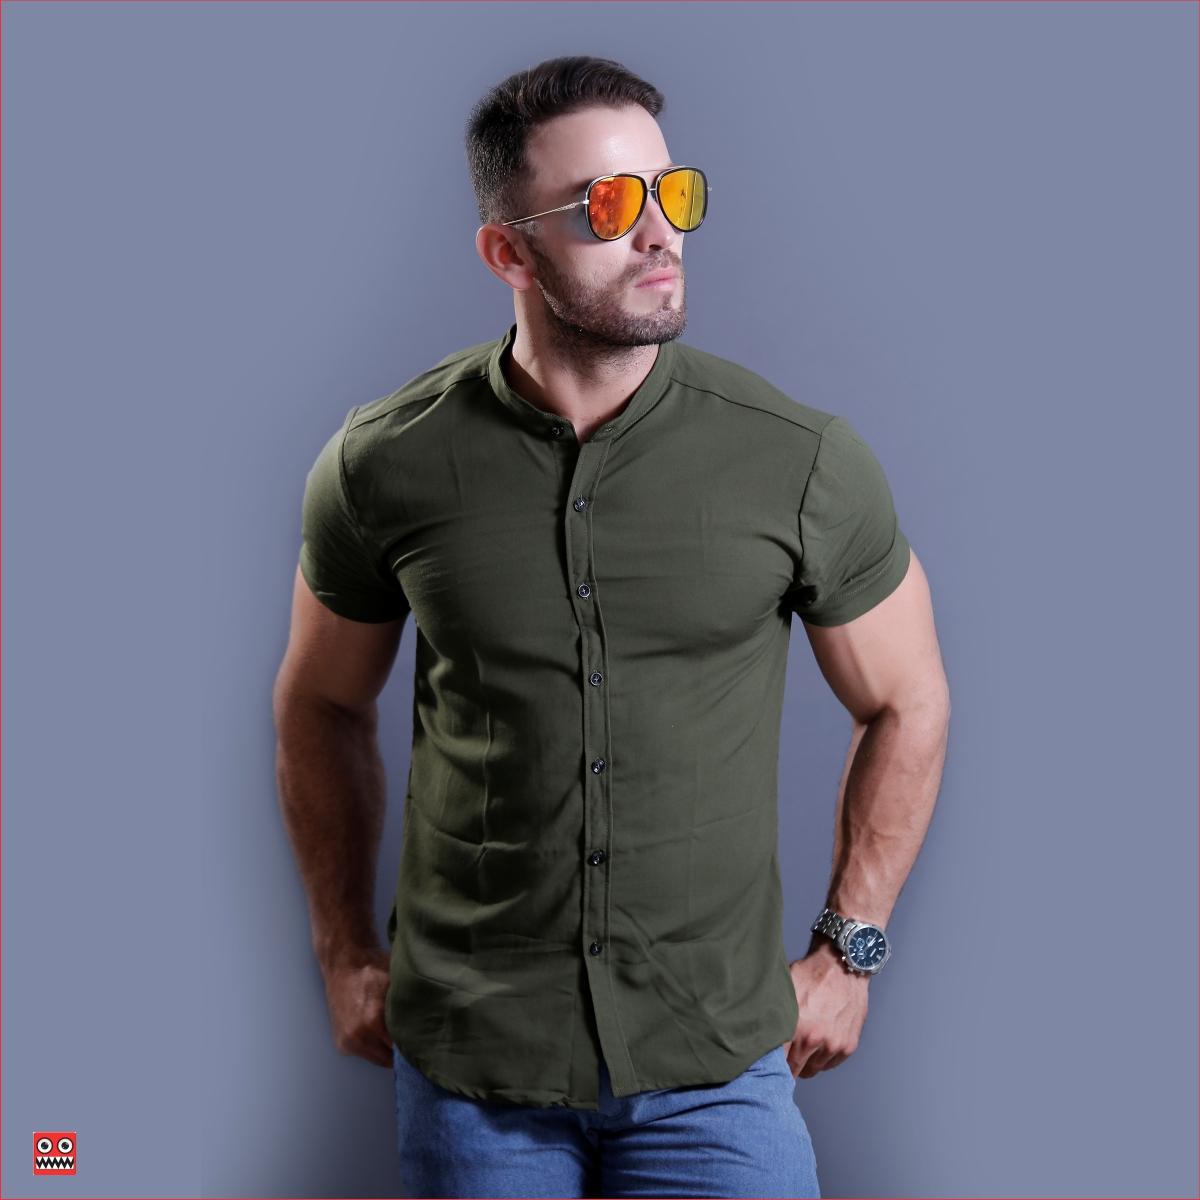 camisa mc ref 1457 verde oliva, tela camisero en viscosa confort.